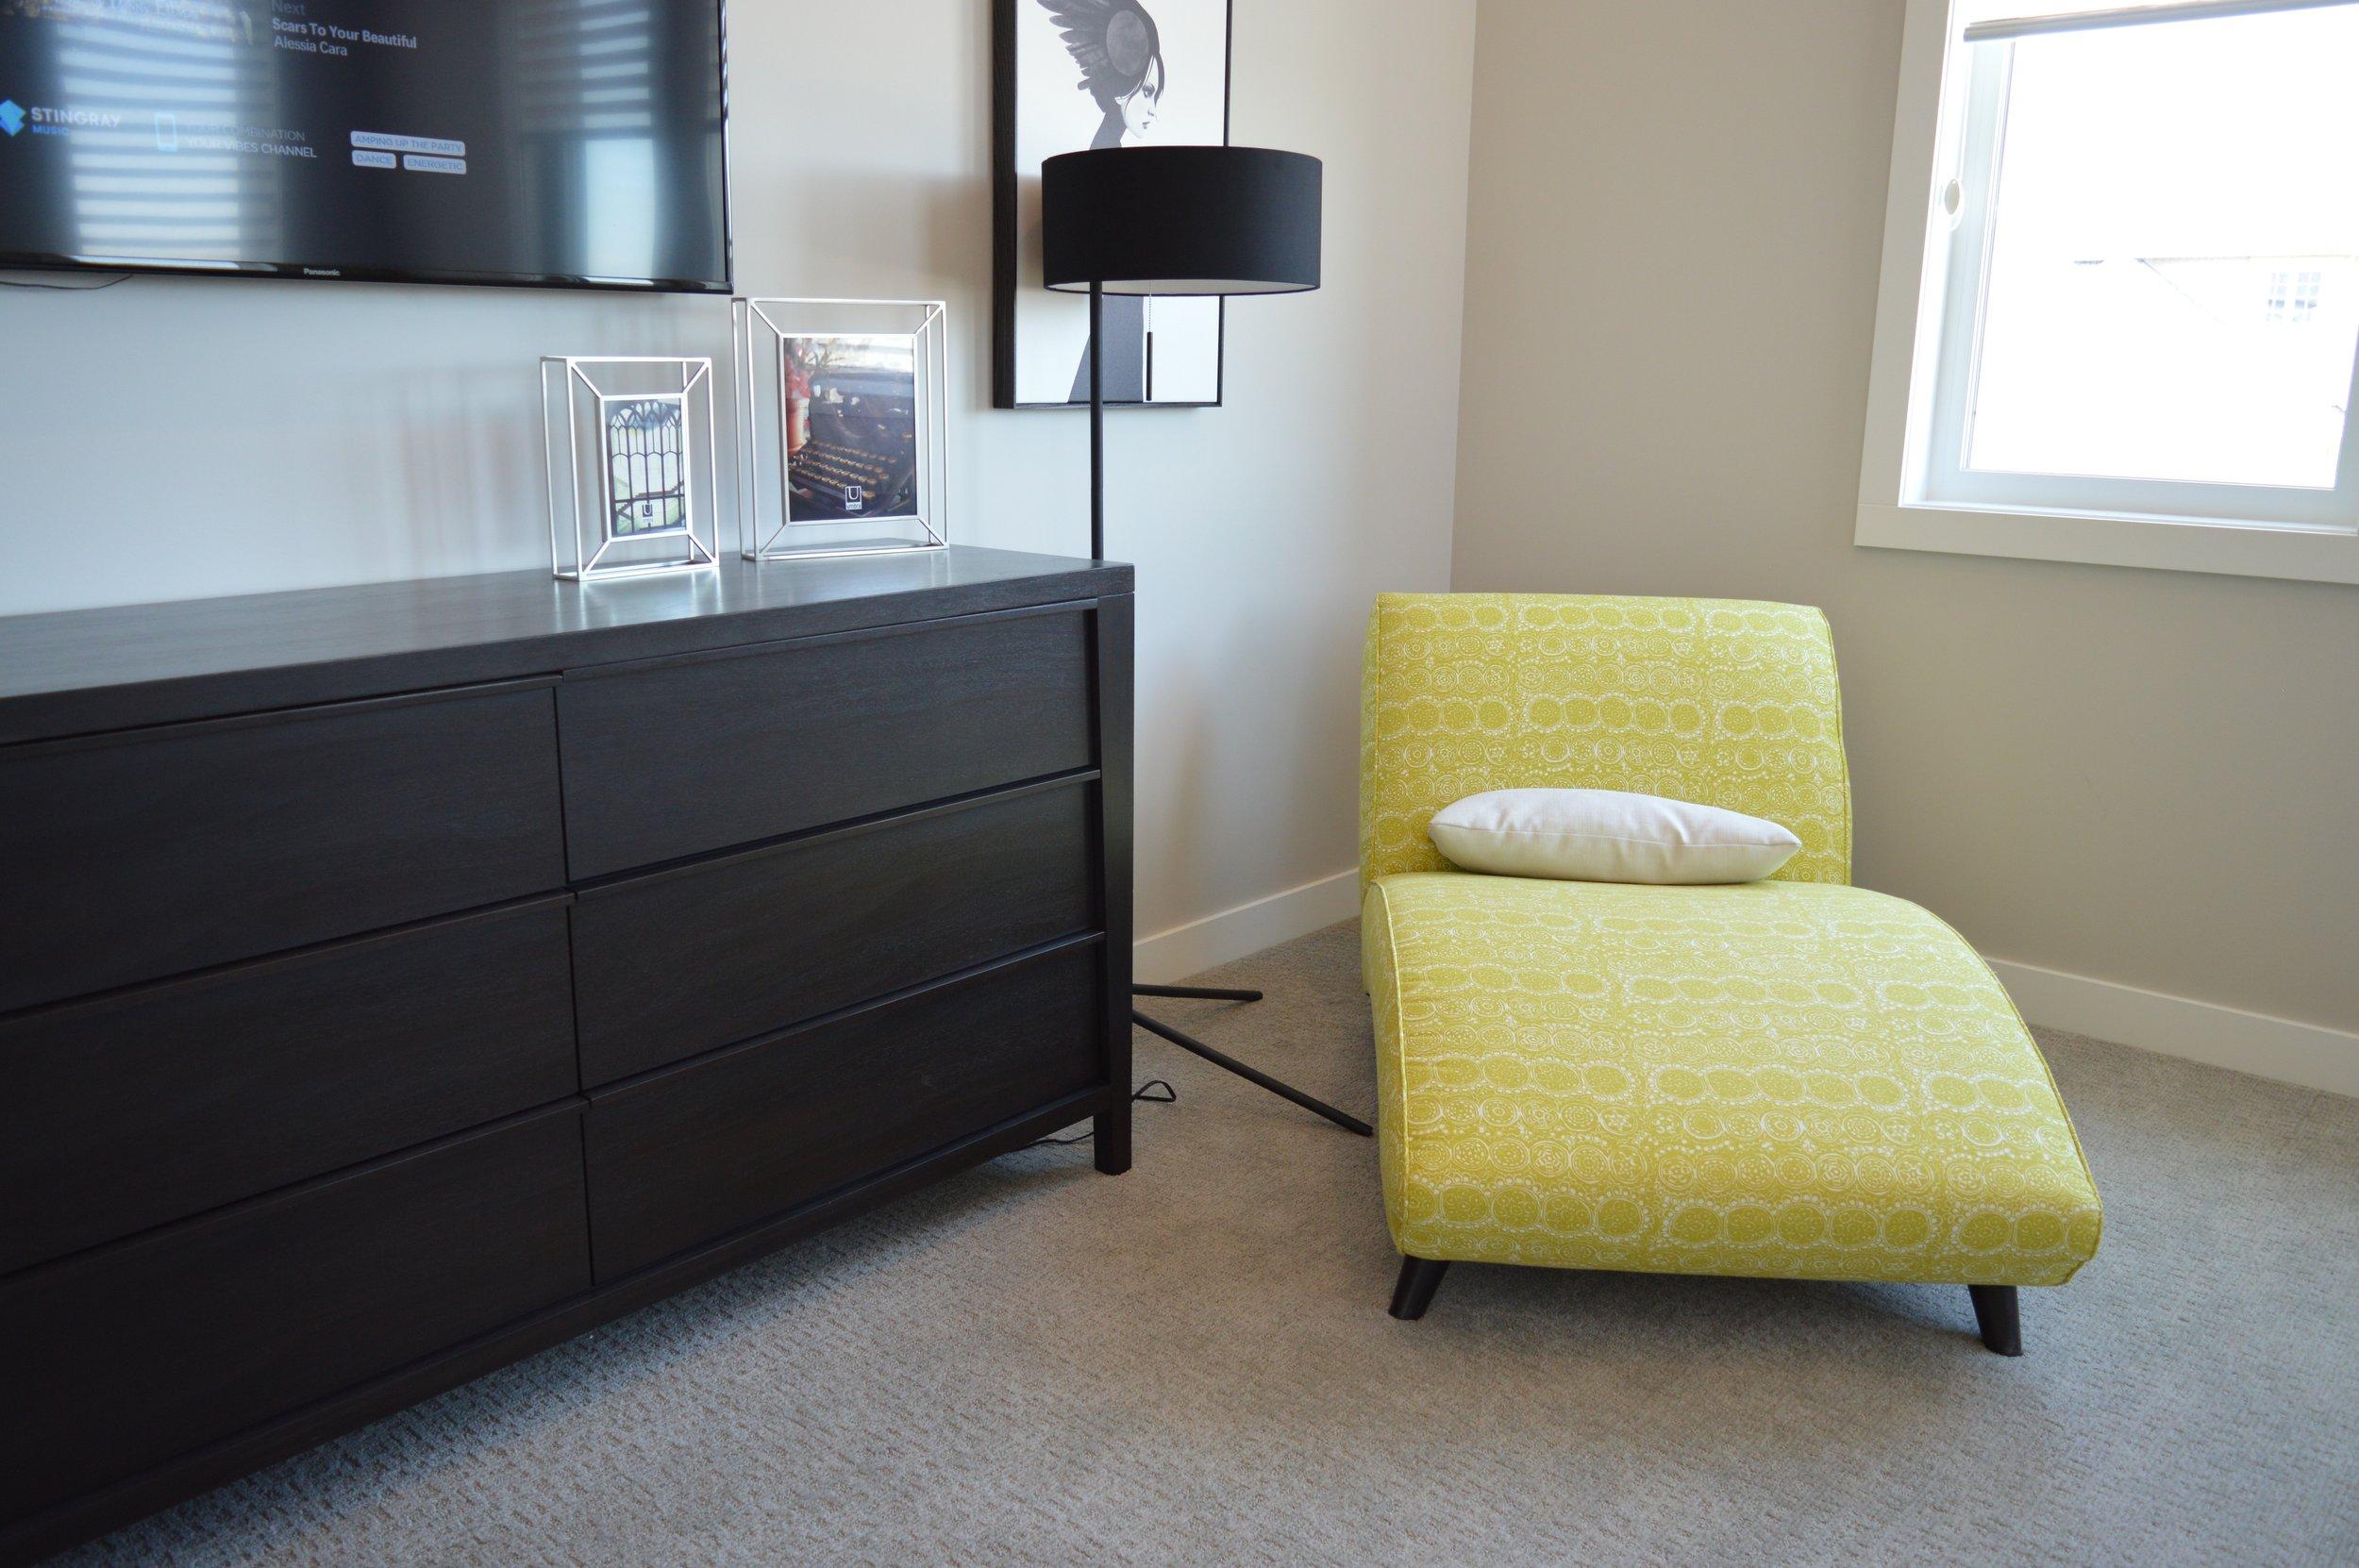 apartment-architecture-bedroom-271660.jpg